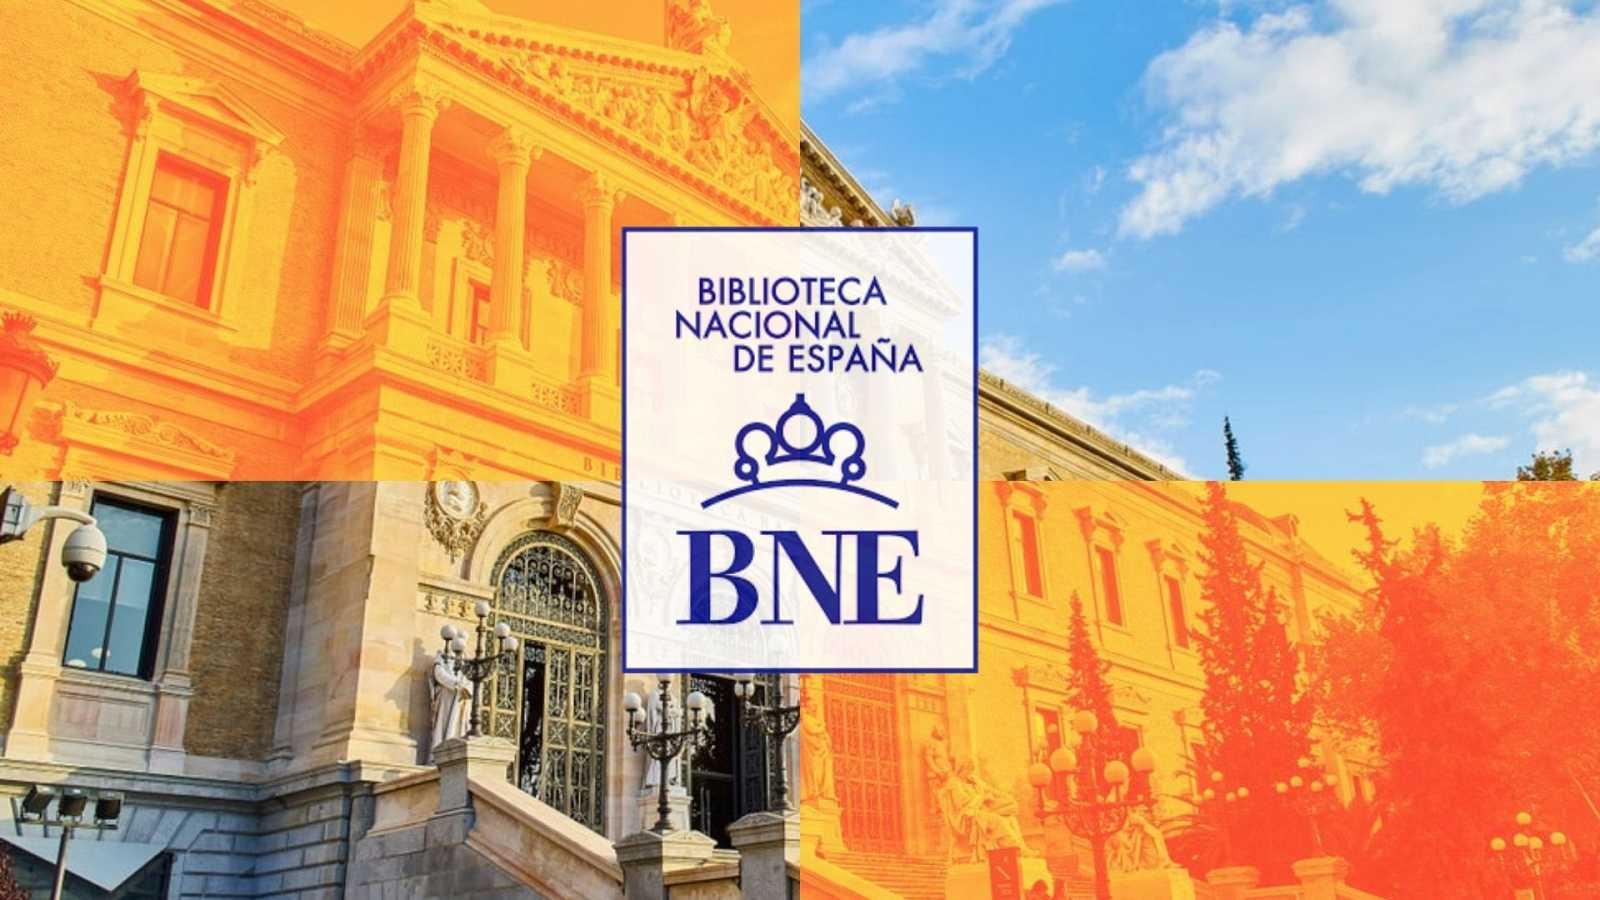 La Biblioteca Nacional (BNE), un patrimonio literario único